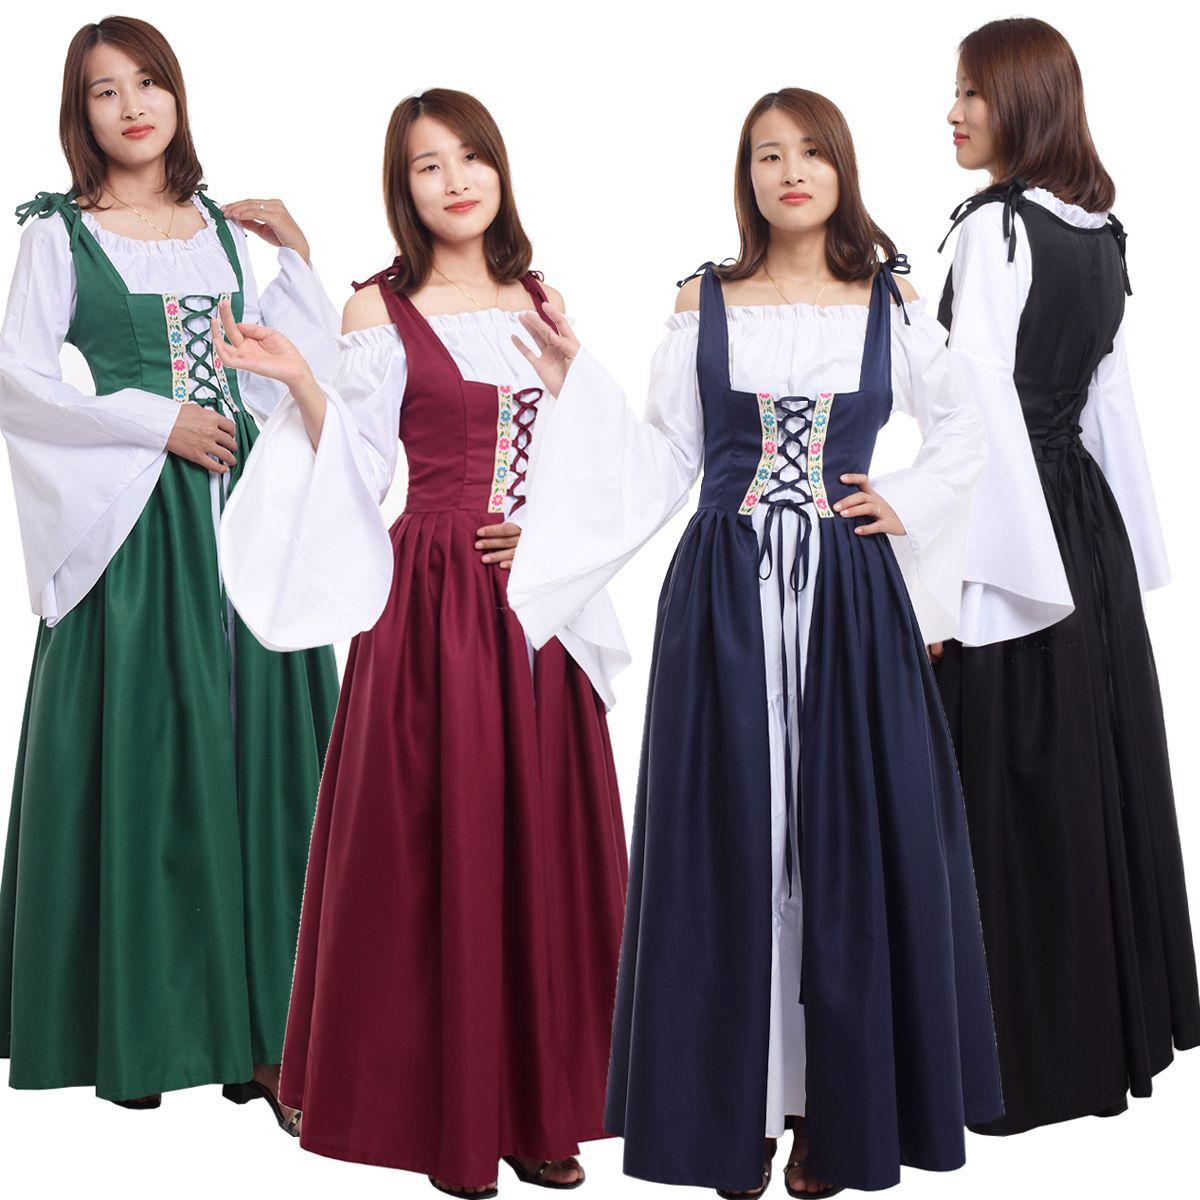 UK Women Prom Dress Medieval Renaissance Dresses Halloween Party Cosplay Dresses